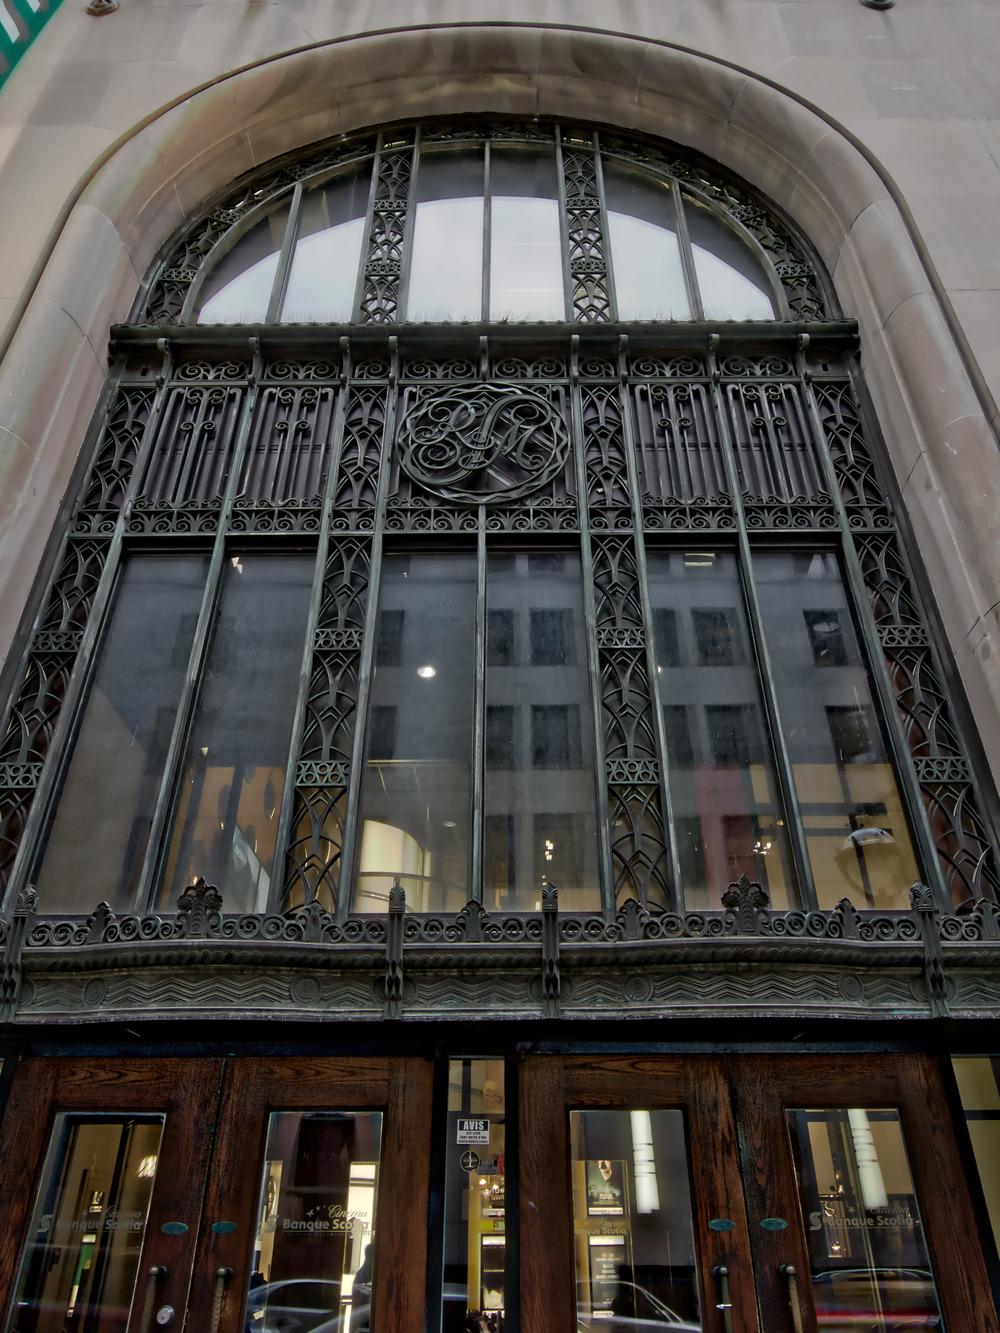 Architecture Maisonneve E of Stanley-21_AuroraHDR_HDR.jpg